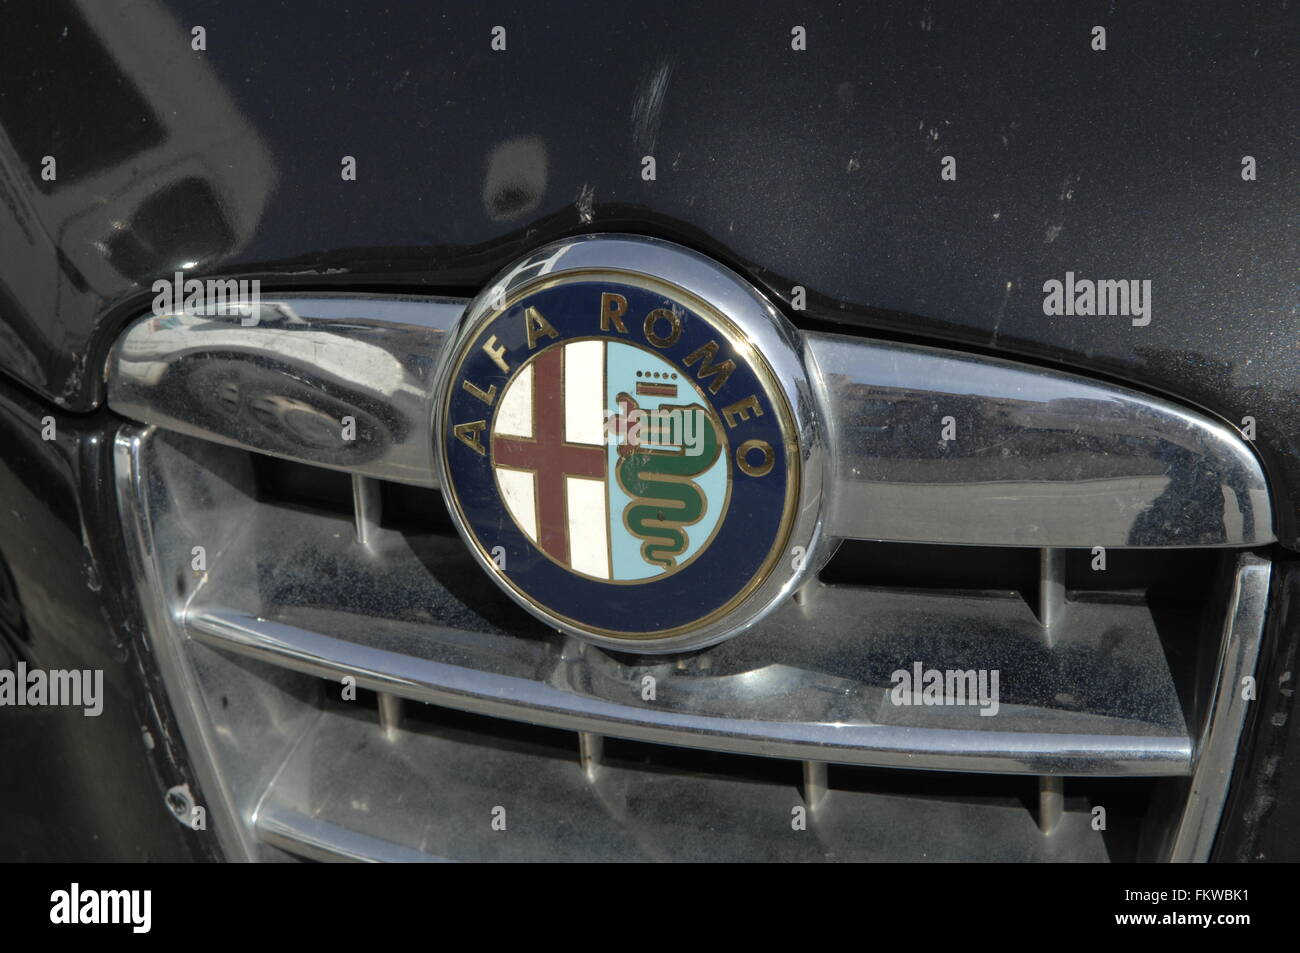 Alfa Romeo Automobiles S.p.A. est un constructeur automobile italien. Fondée comme A.L.F.A. ('Anonima Lombarda Photo Stock